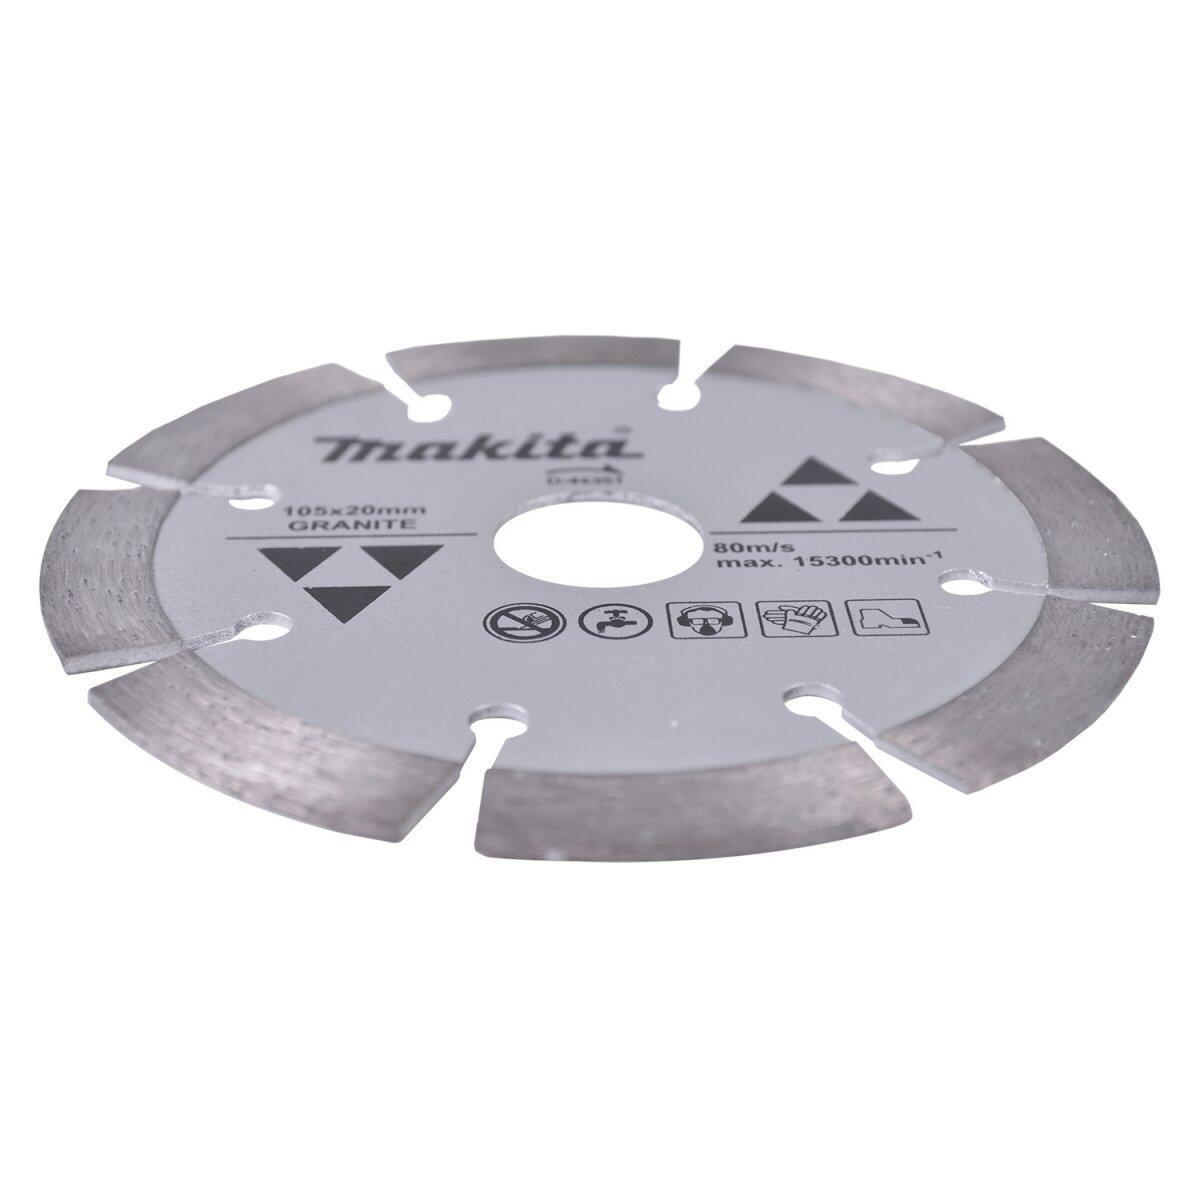 Serra Mármore C/ 2 Discos Concreto 4100NH3Z Makita 127V + Disco Granito